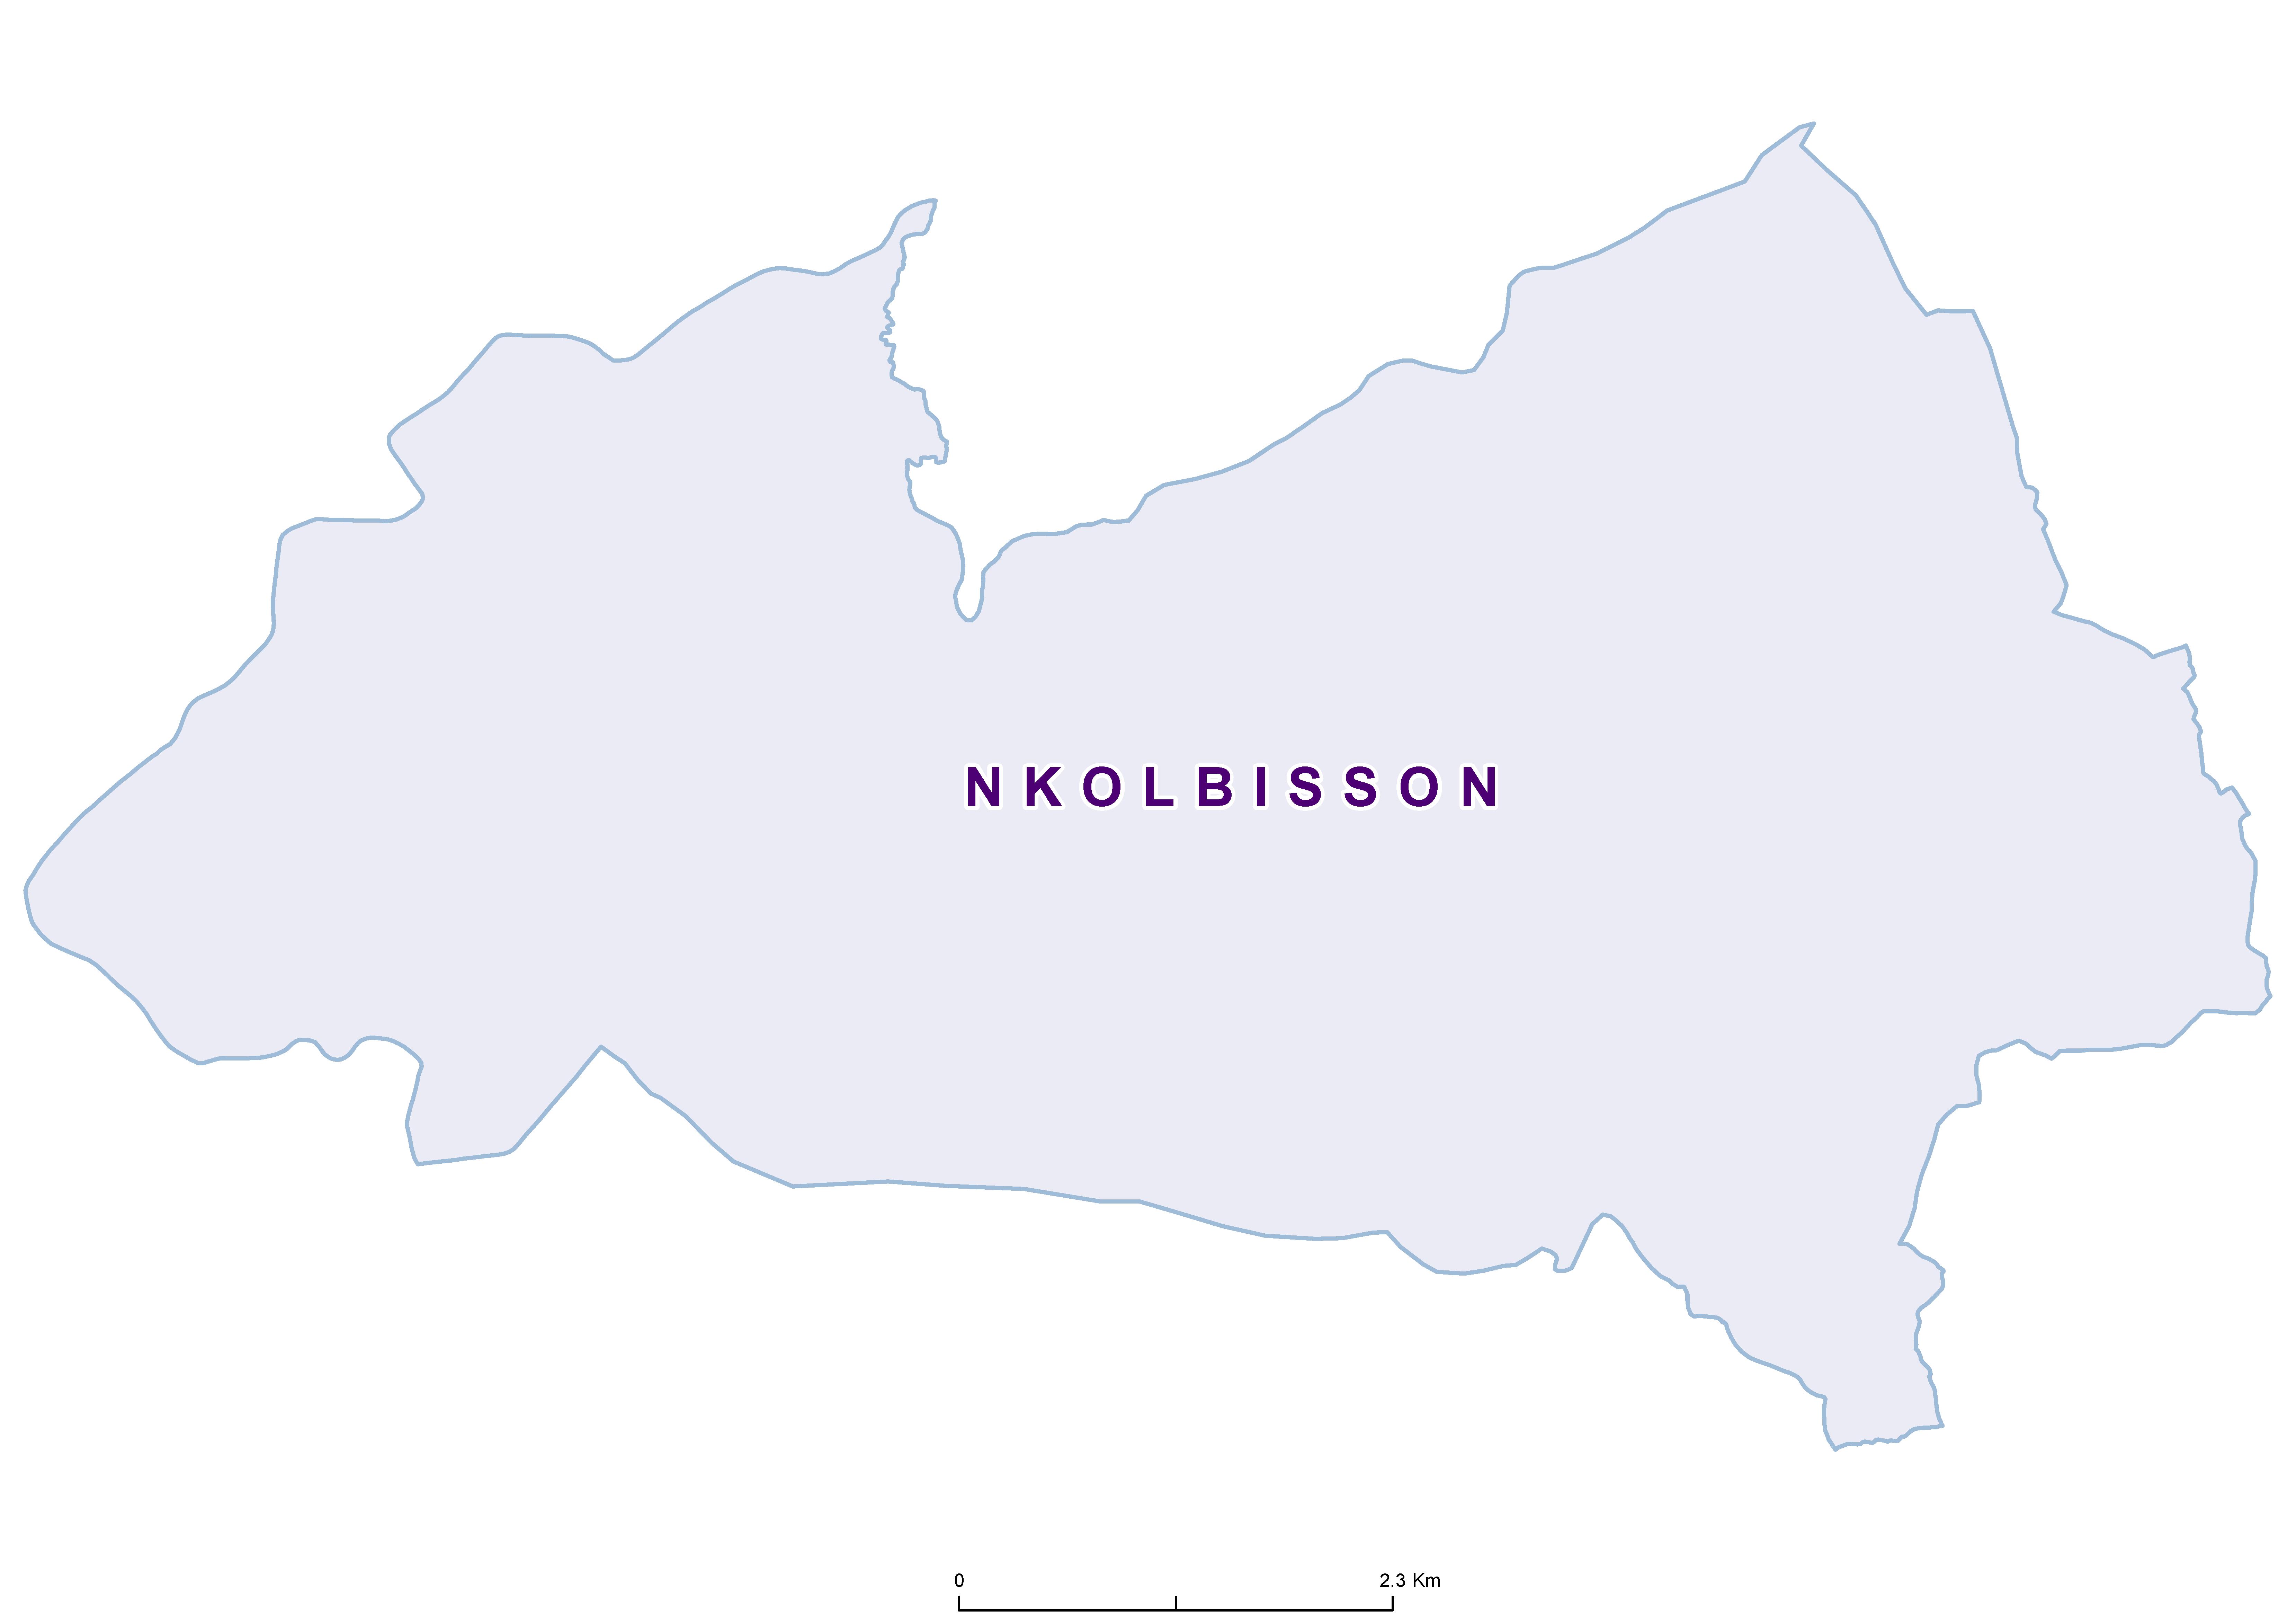 Nkolbisson Max STH 19850001